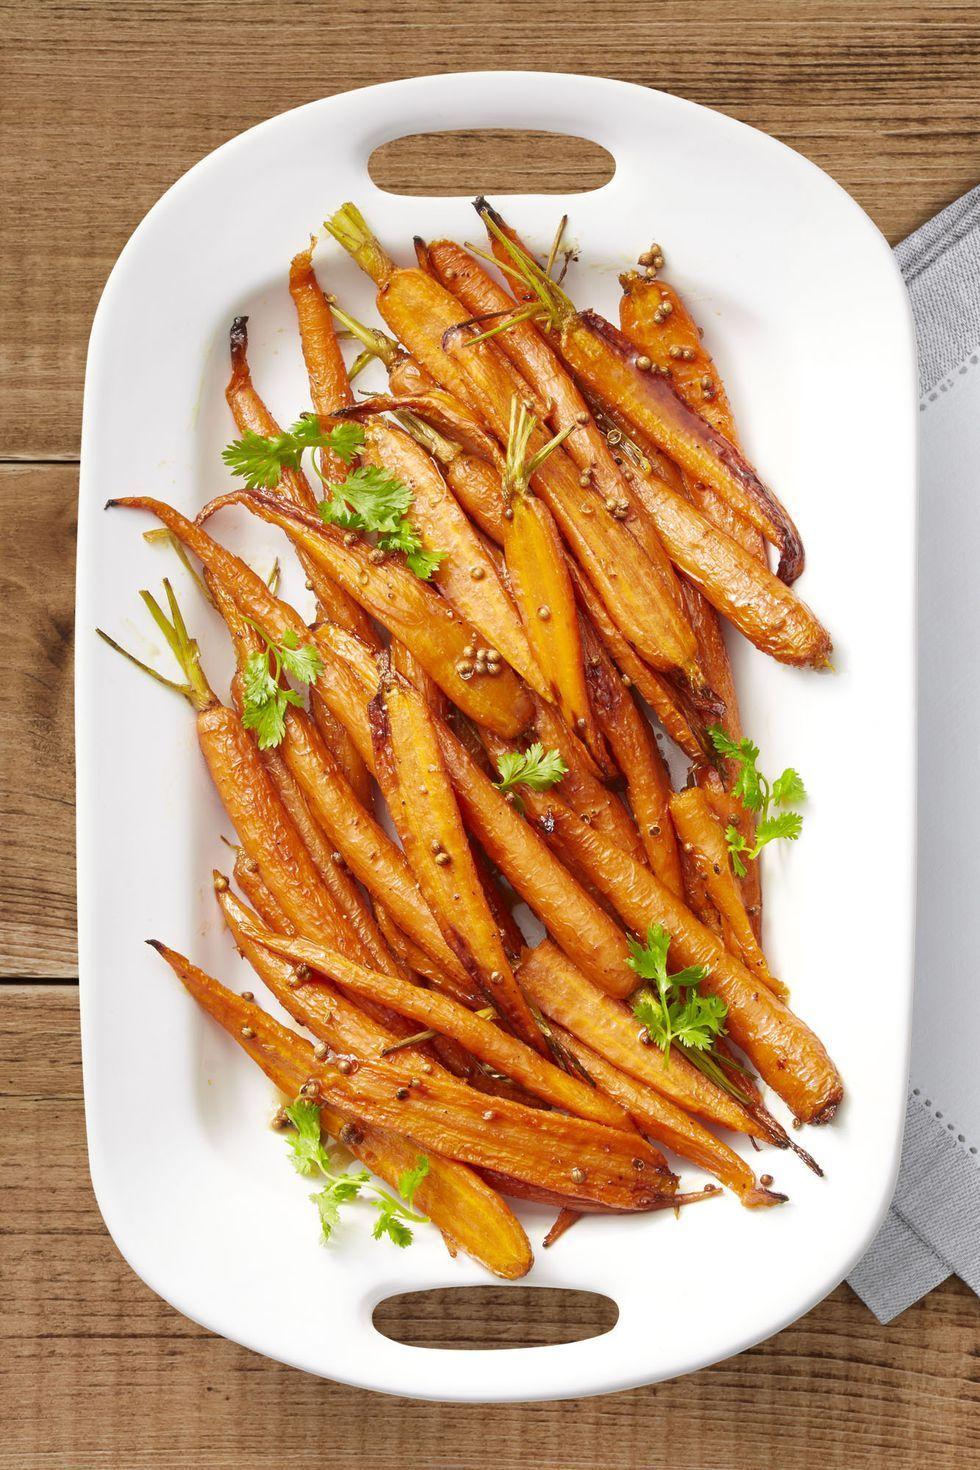 Lemon-Maple Roasted Carrots